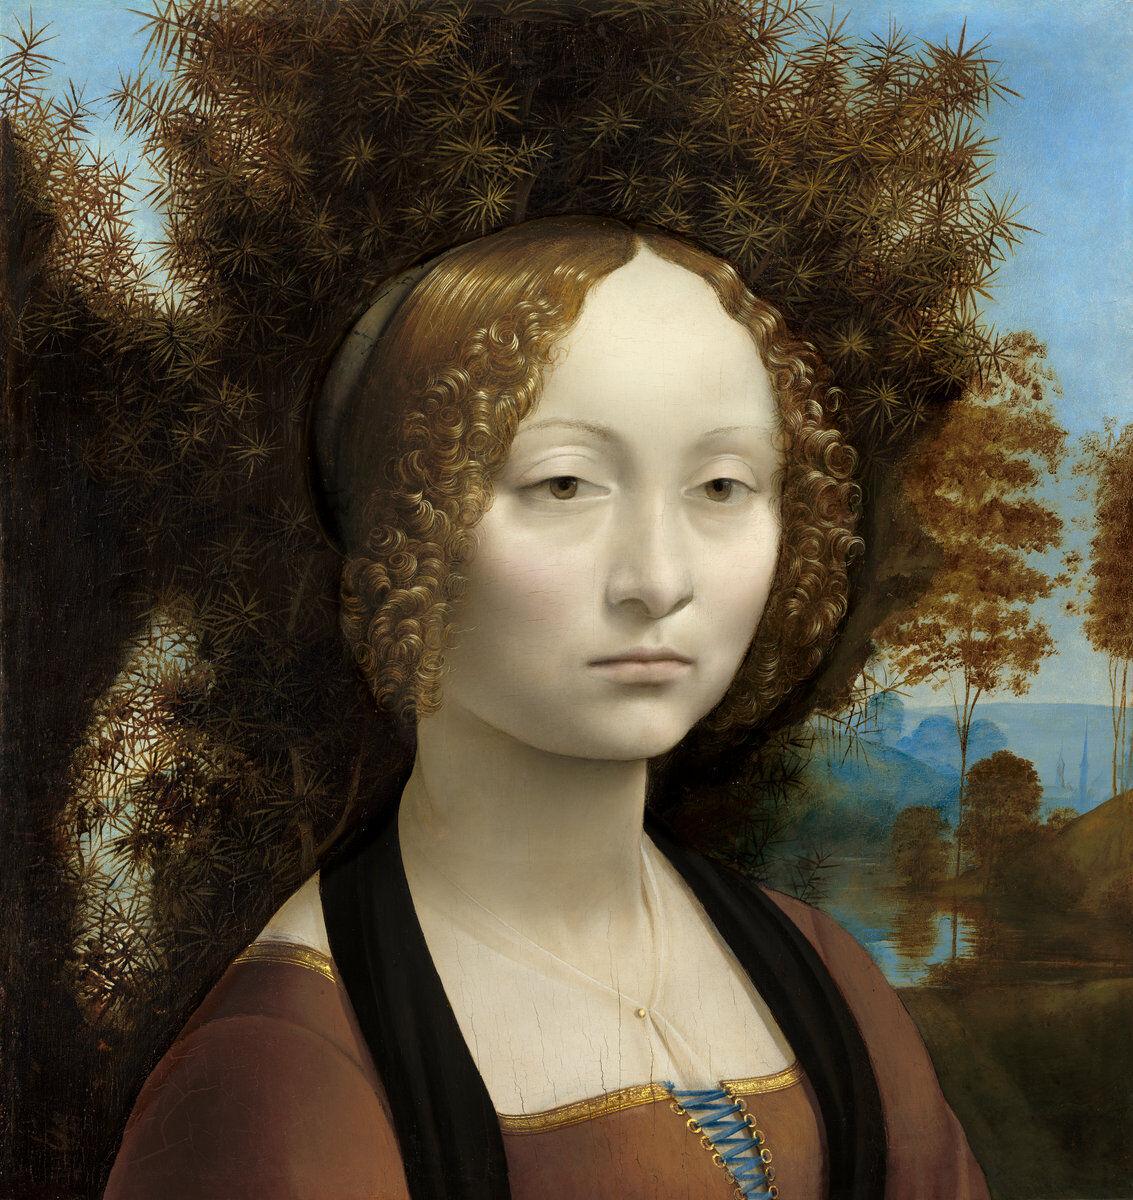 Leonardo da Vinci, Ginevra de' Benci [obverse], c. 1474/1478. Courtesy of the National Gallery of Art.